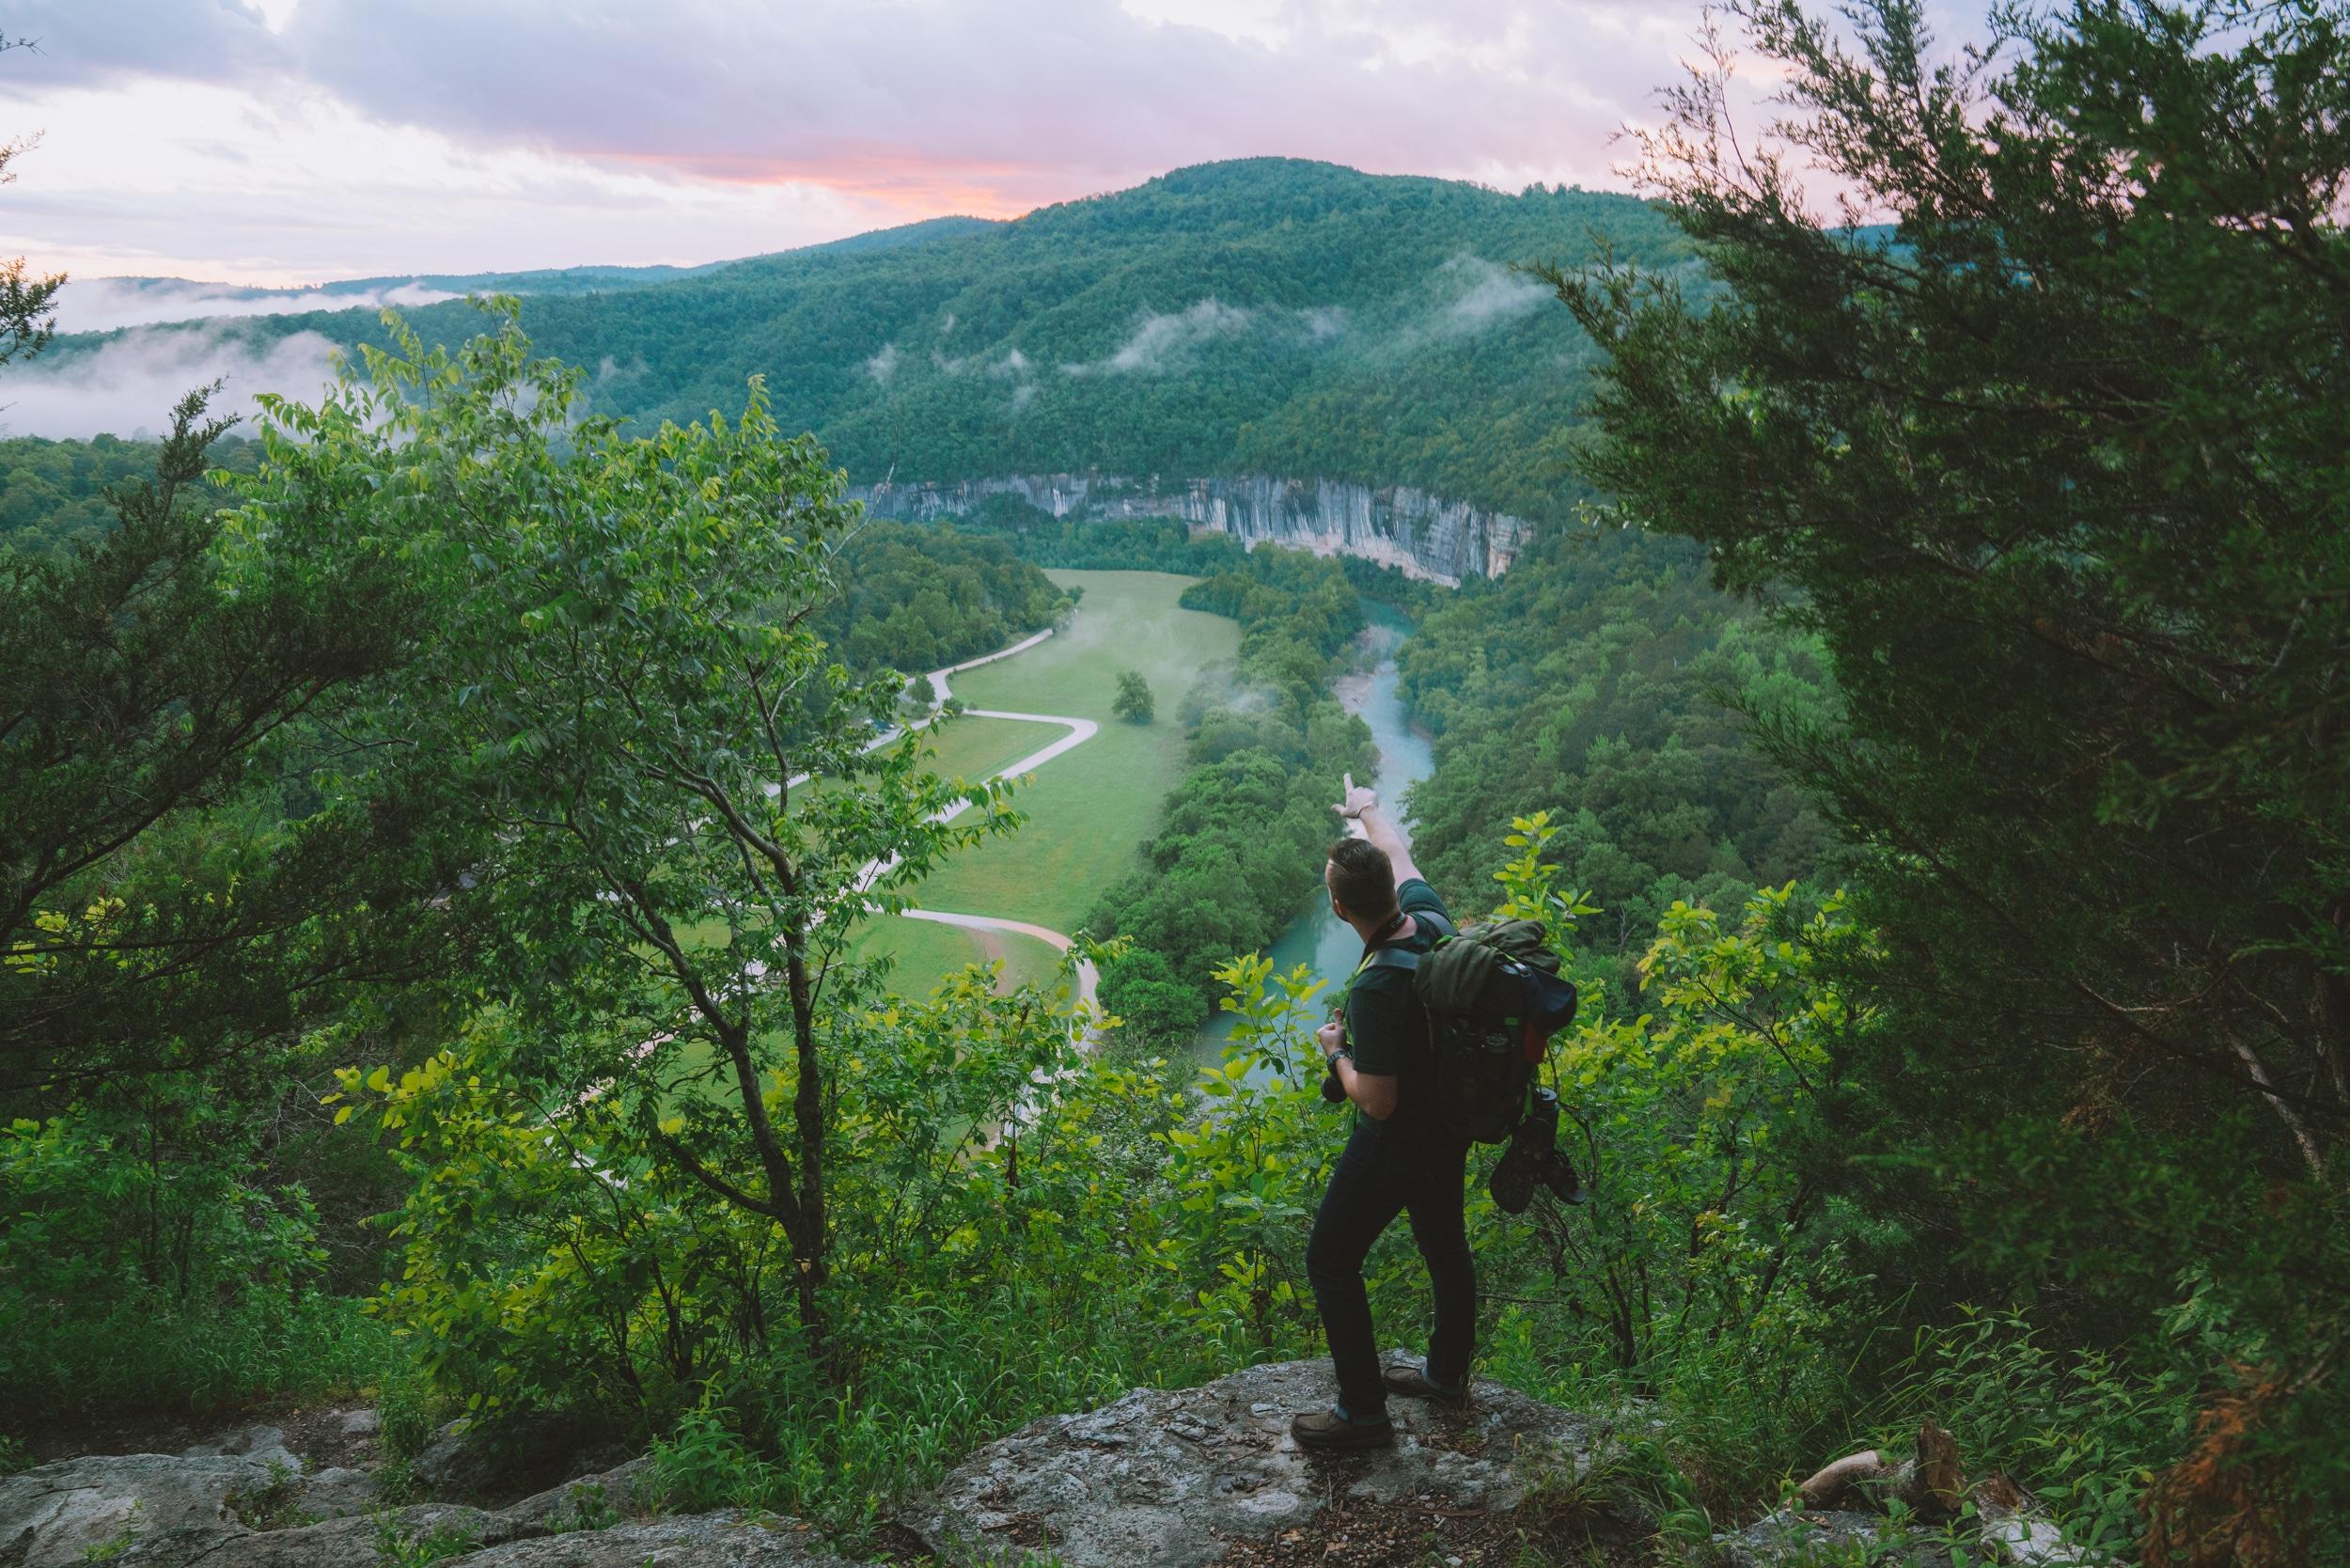 A hiker in Buffalo River Country enjoying the sunset views